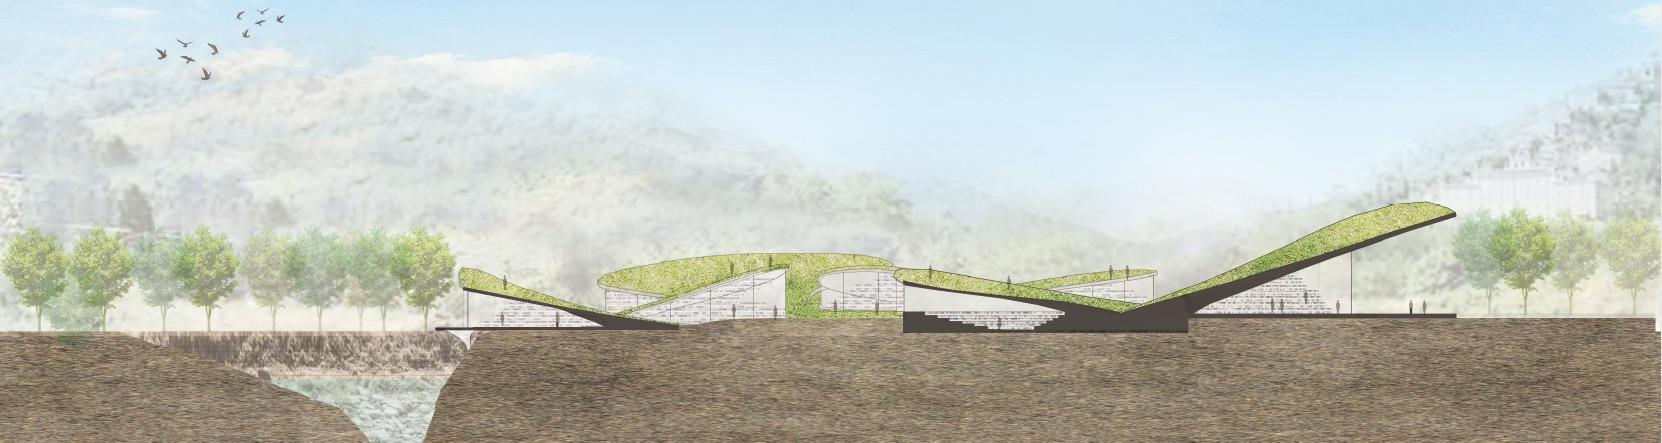 Section Yasui Design Lab. 2017